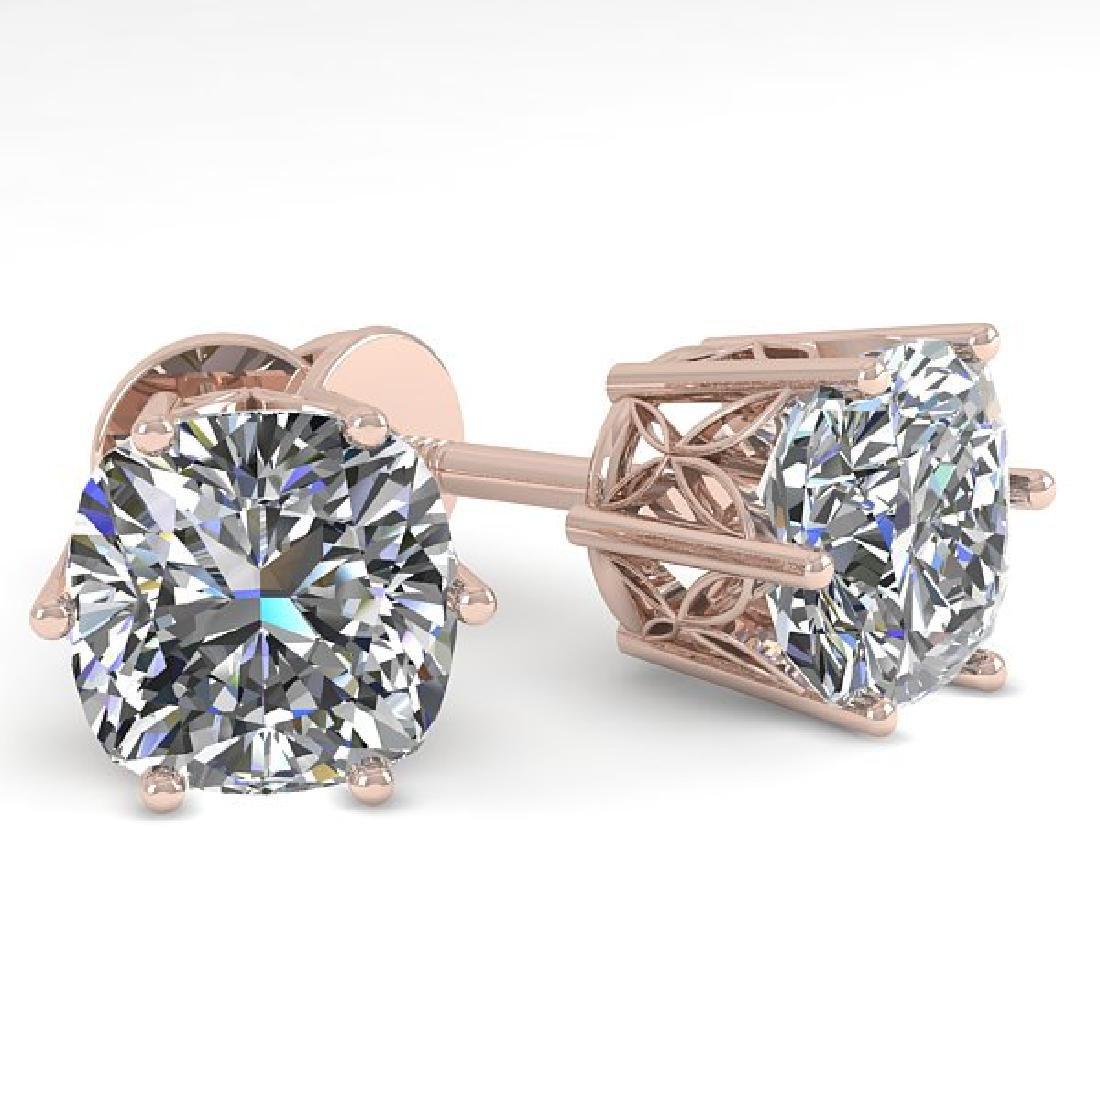 1.0 CTW VS/SI Cut Cushion Diamond Stud Art Deco